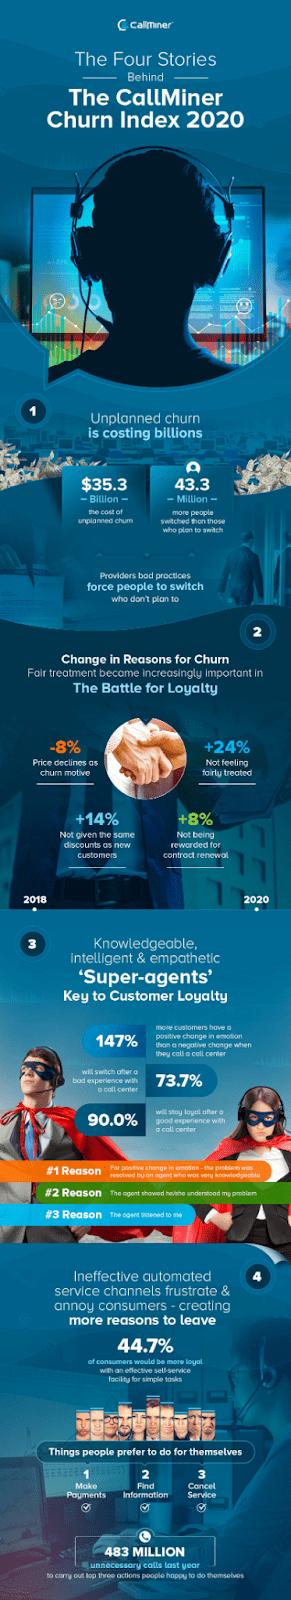 Churn Rate the Callminer